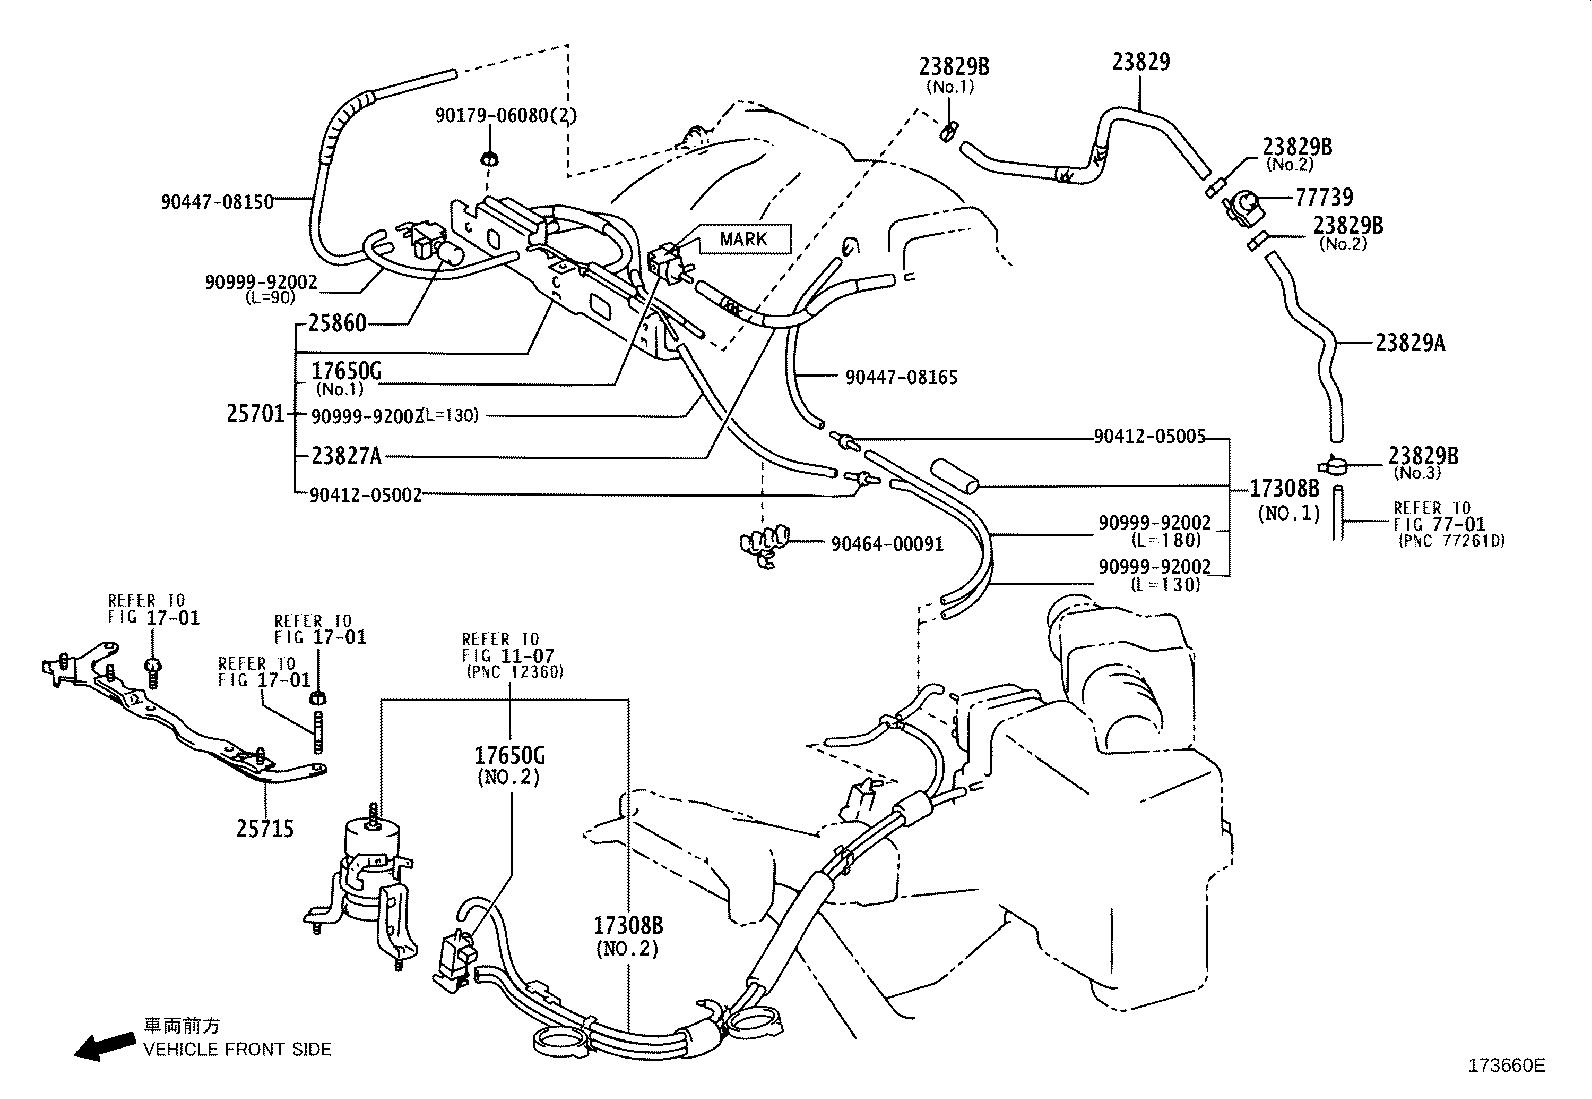 Lexus Rx 330 Vapor Canister Purge Solenoid Valve